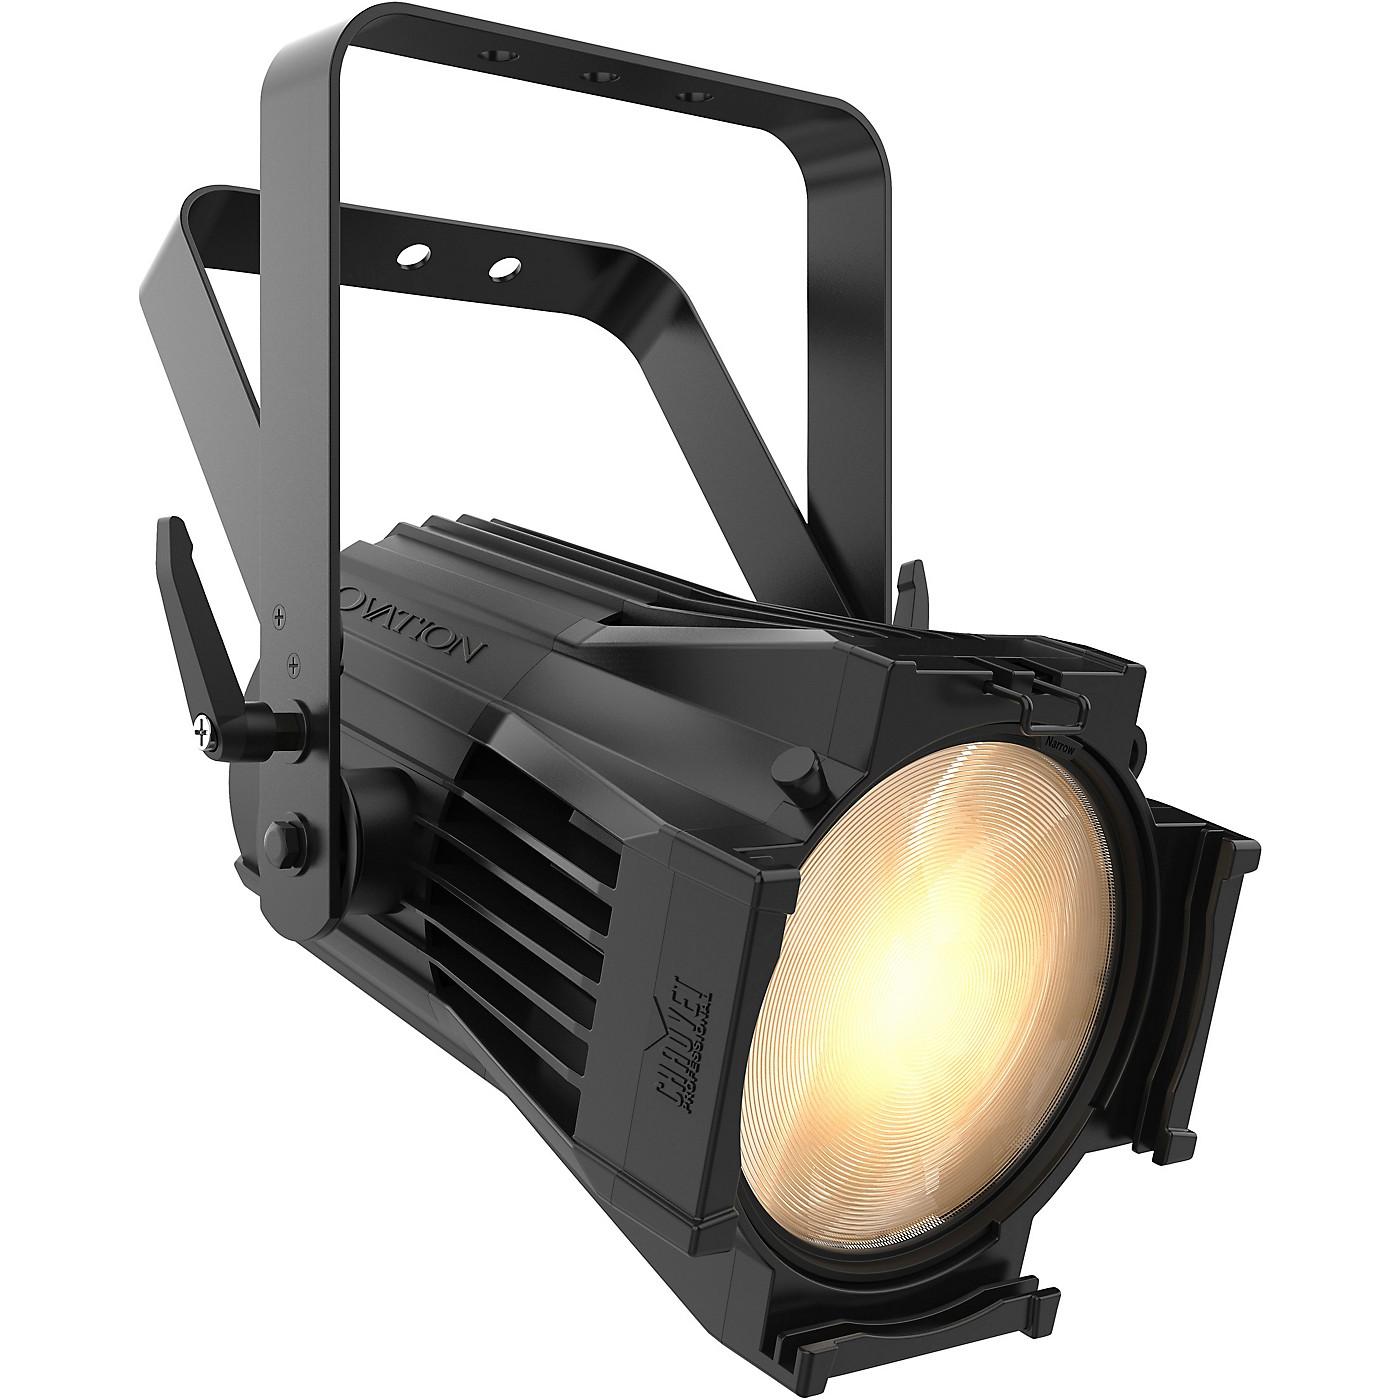 CHAUVET Professional Ovation P-56WW Warm White LED Light thumbnail